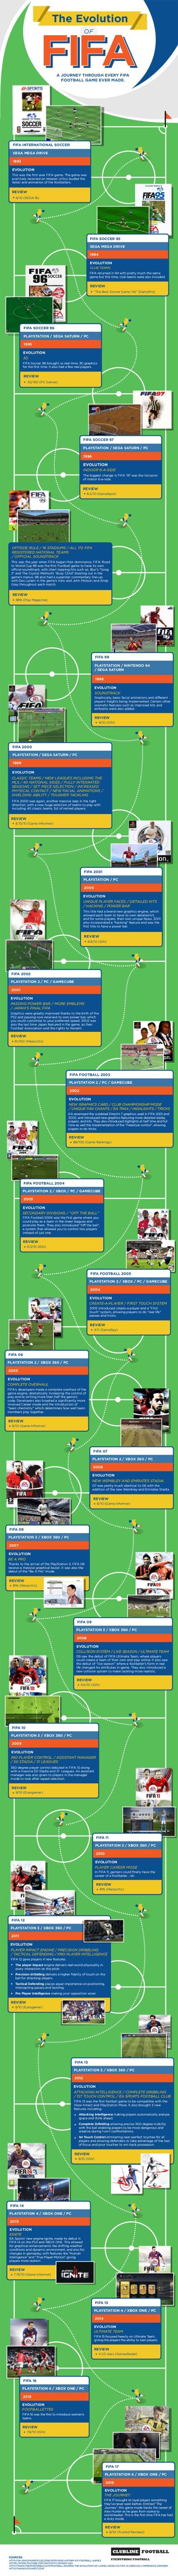 Fifa-infographic-final-mod